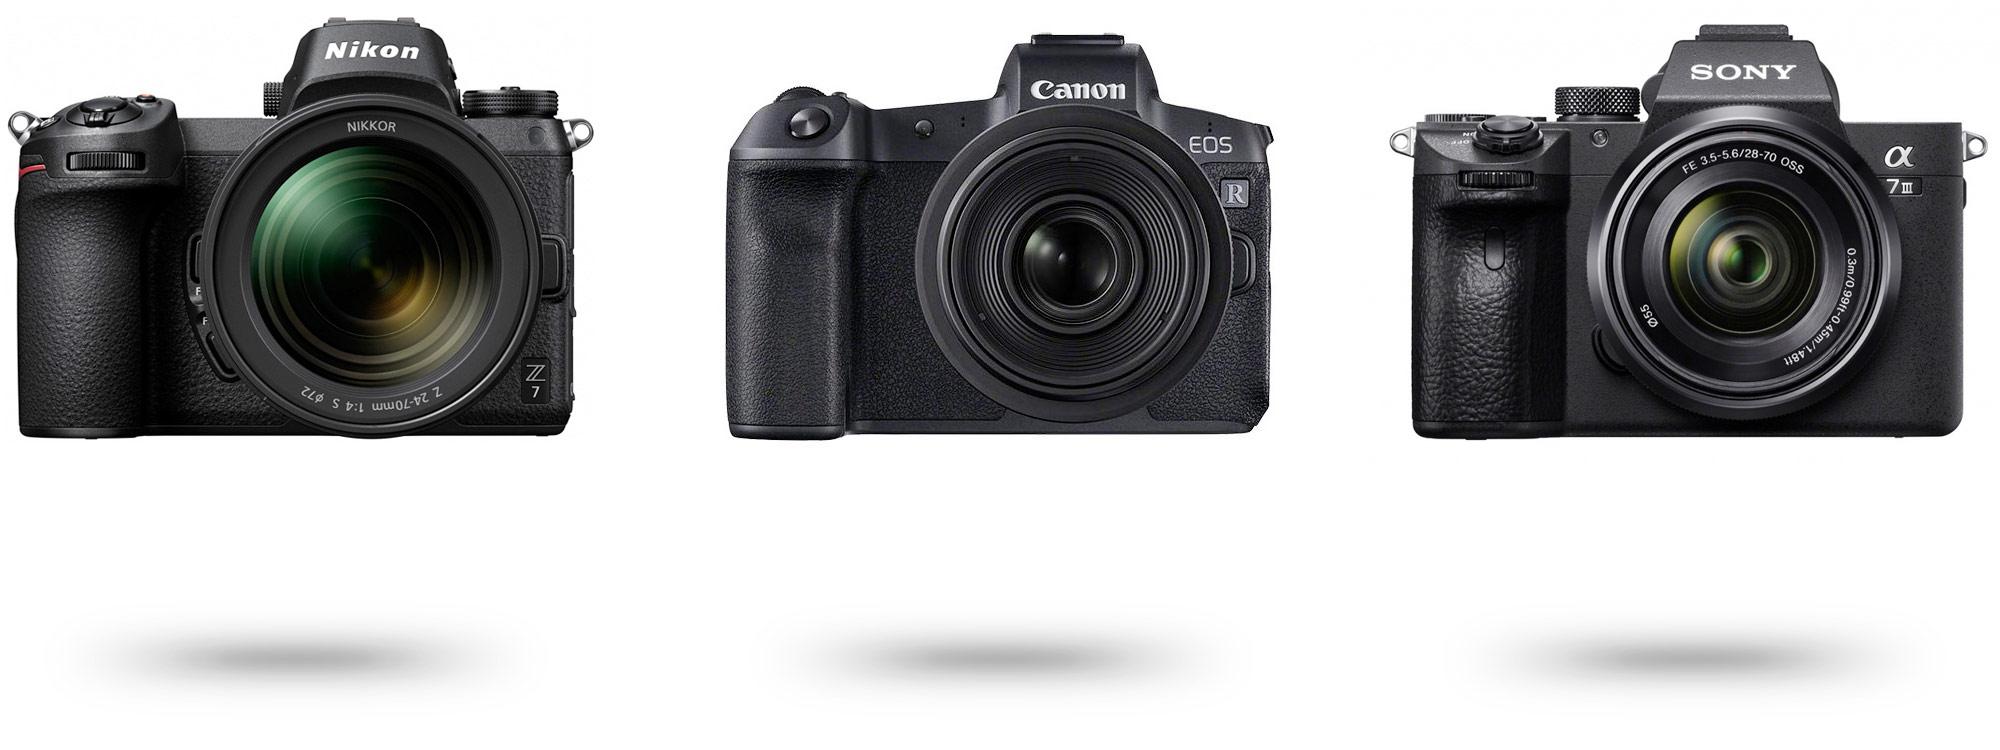 Nikon Z7, Canon EOS R, Sony Alpha 7III R